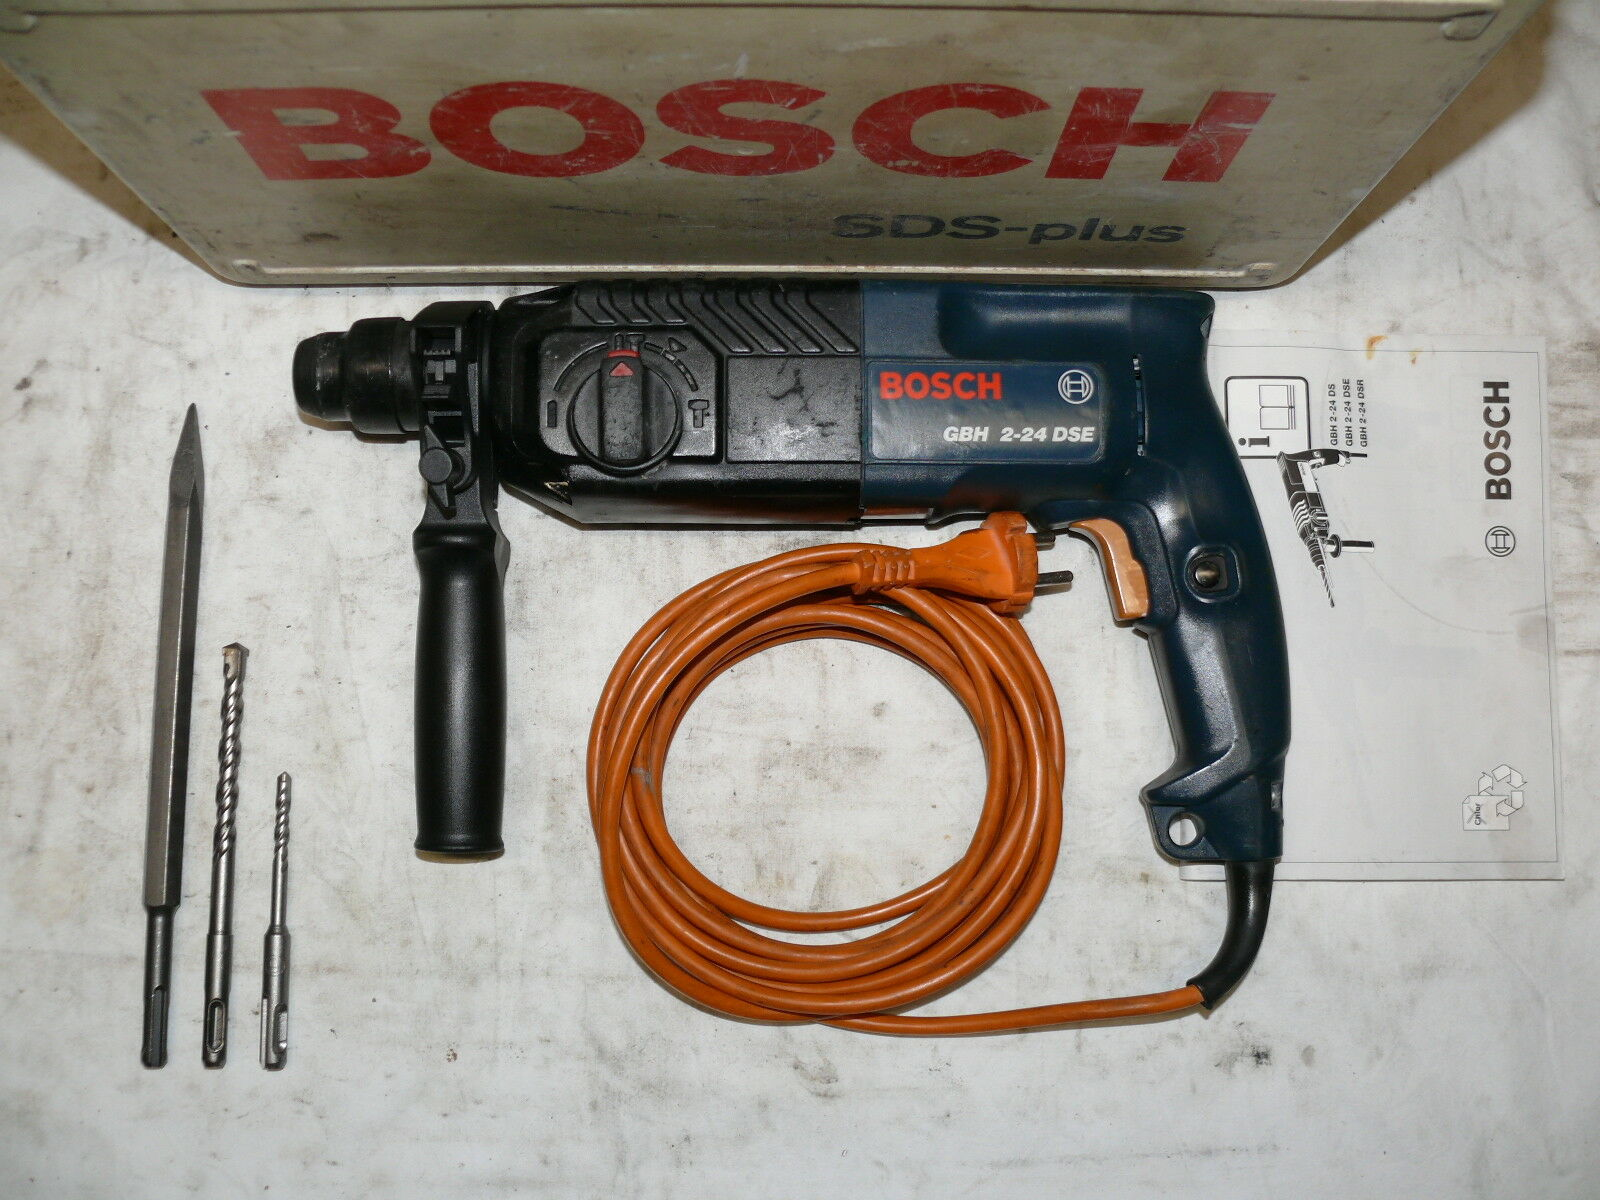 Bosch GBH 2-24 DSE BOHRHAMMER MEIßELHAMMER KOMBIHAMMER STEMMHAMMER ähnl. 2-26